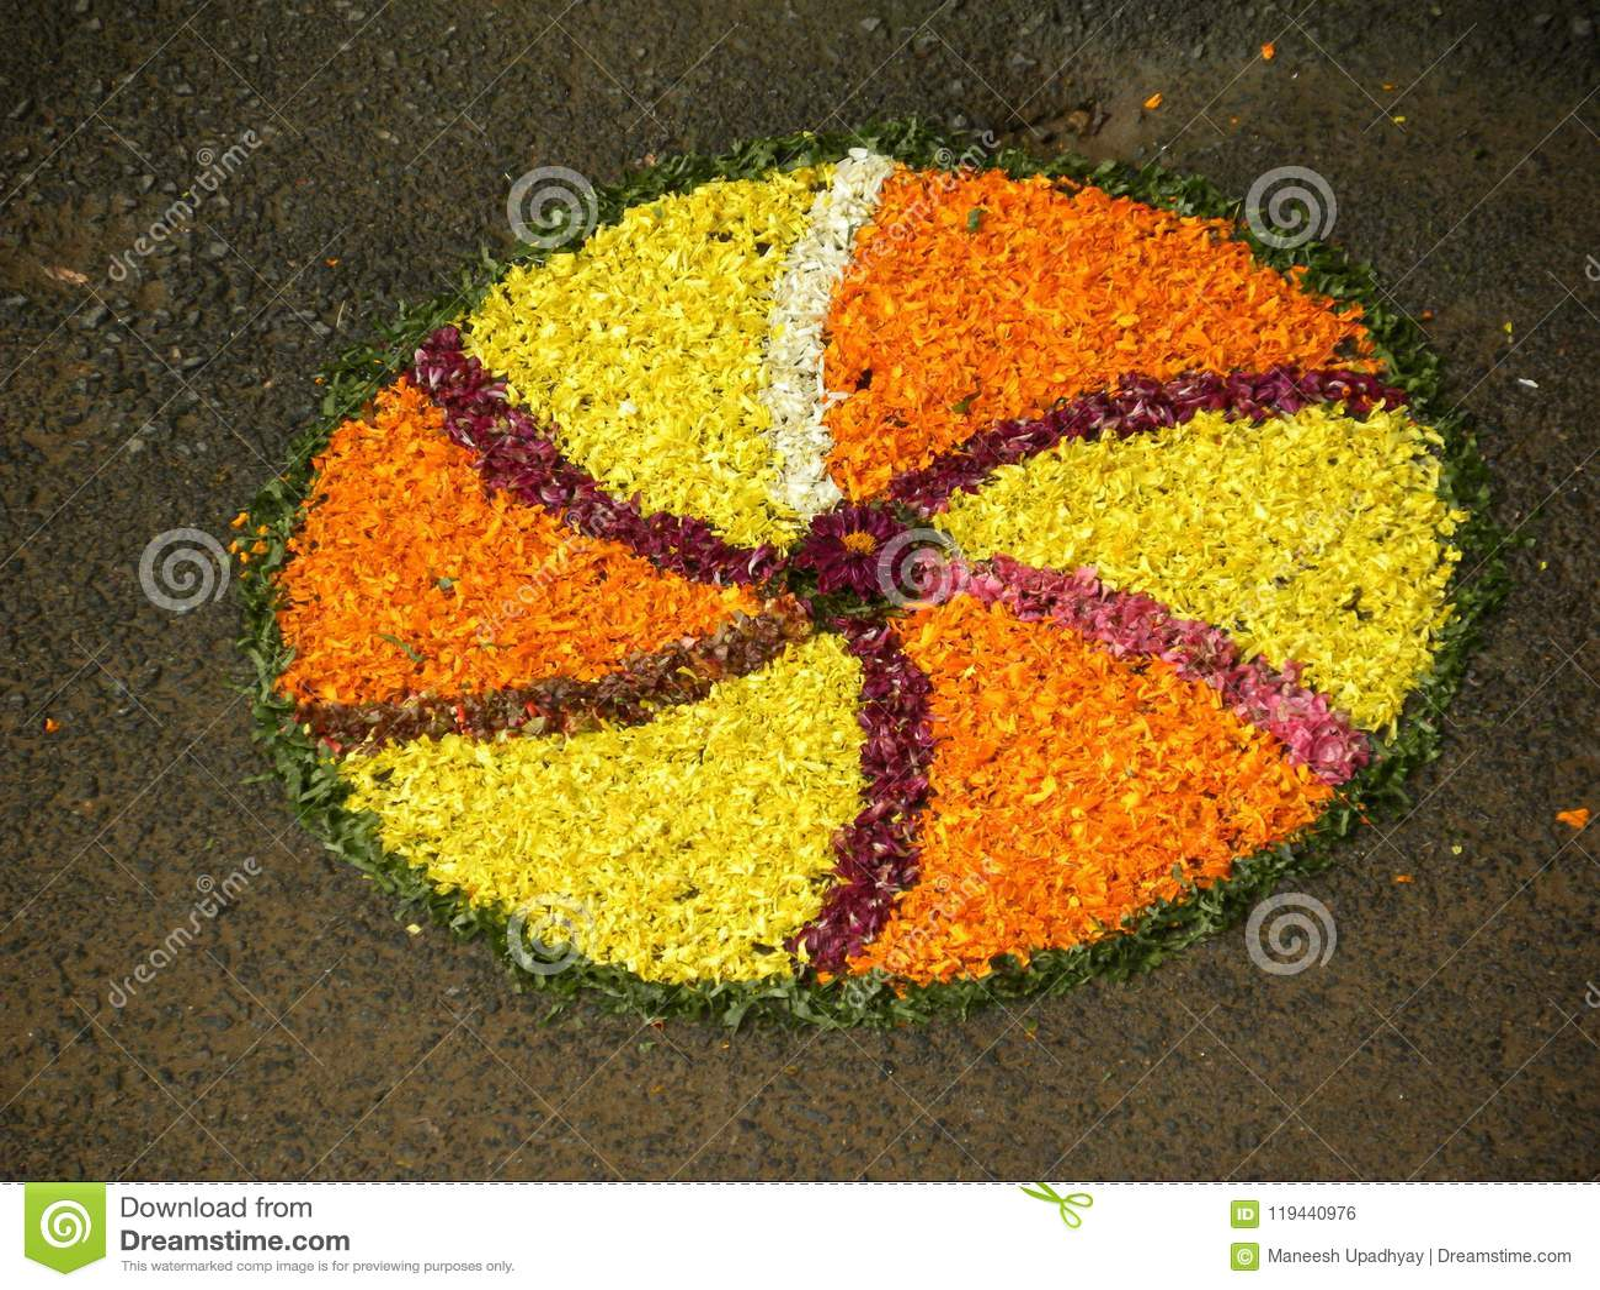 Rangoli Design Made By Yellow And Orange Marigold Flowers Stock